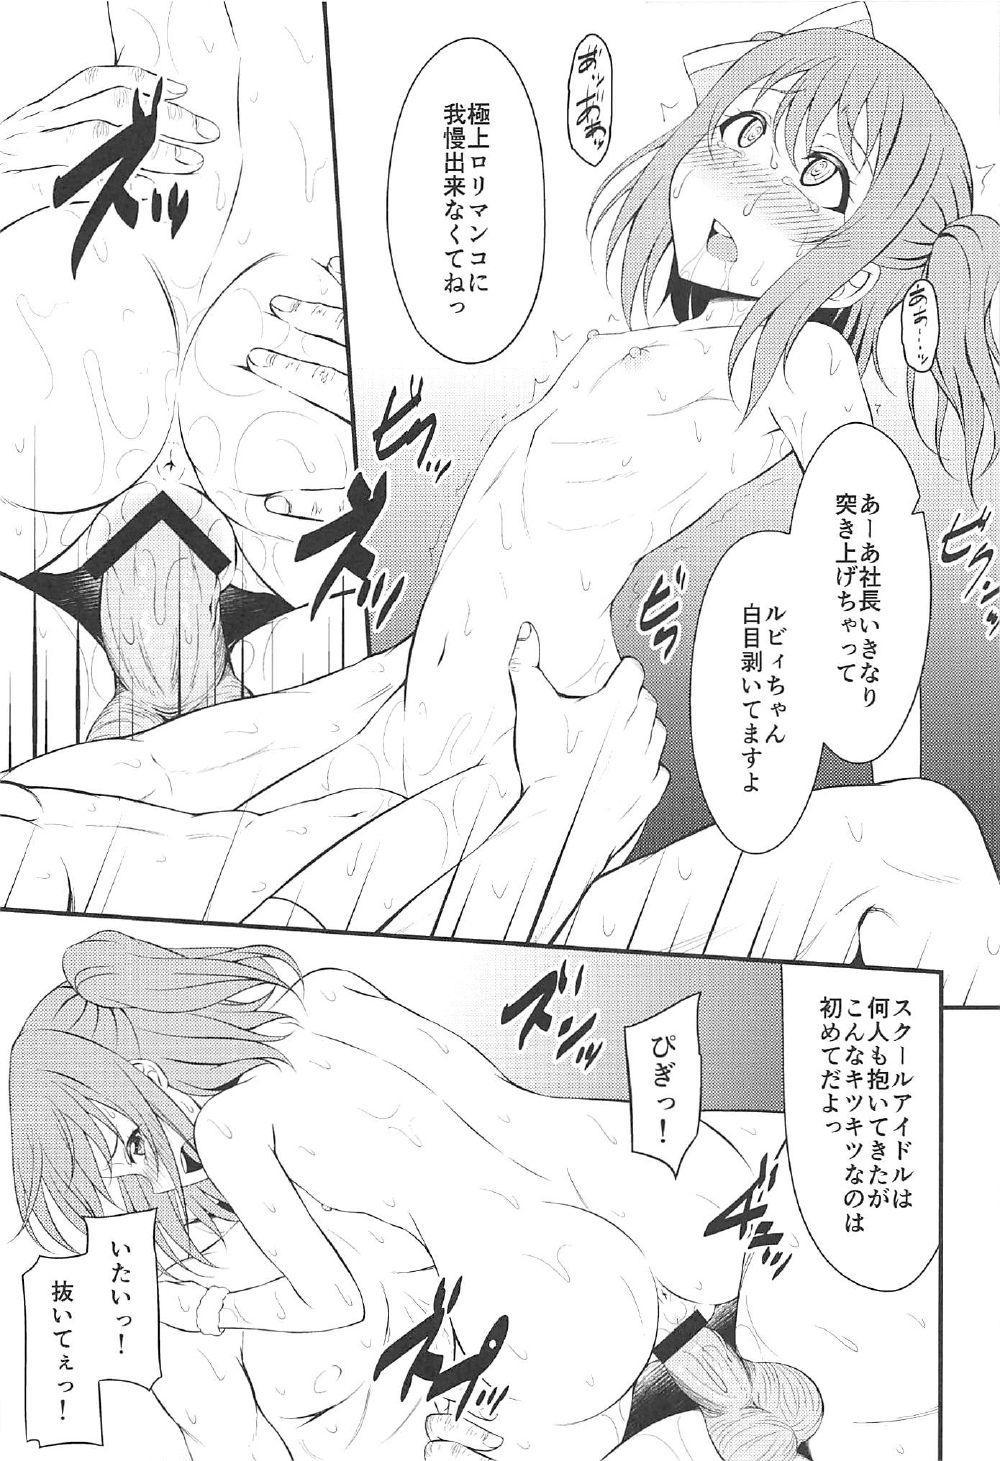 Makura Eigyou Ganbaruby! 9